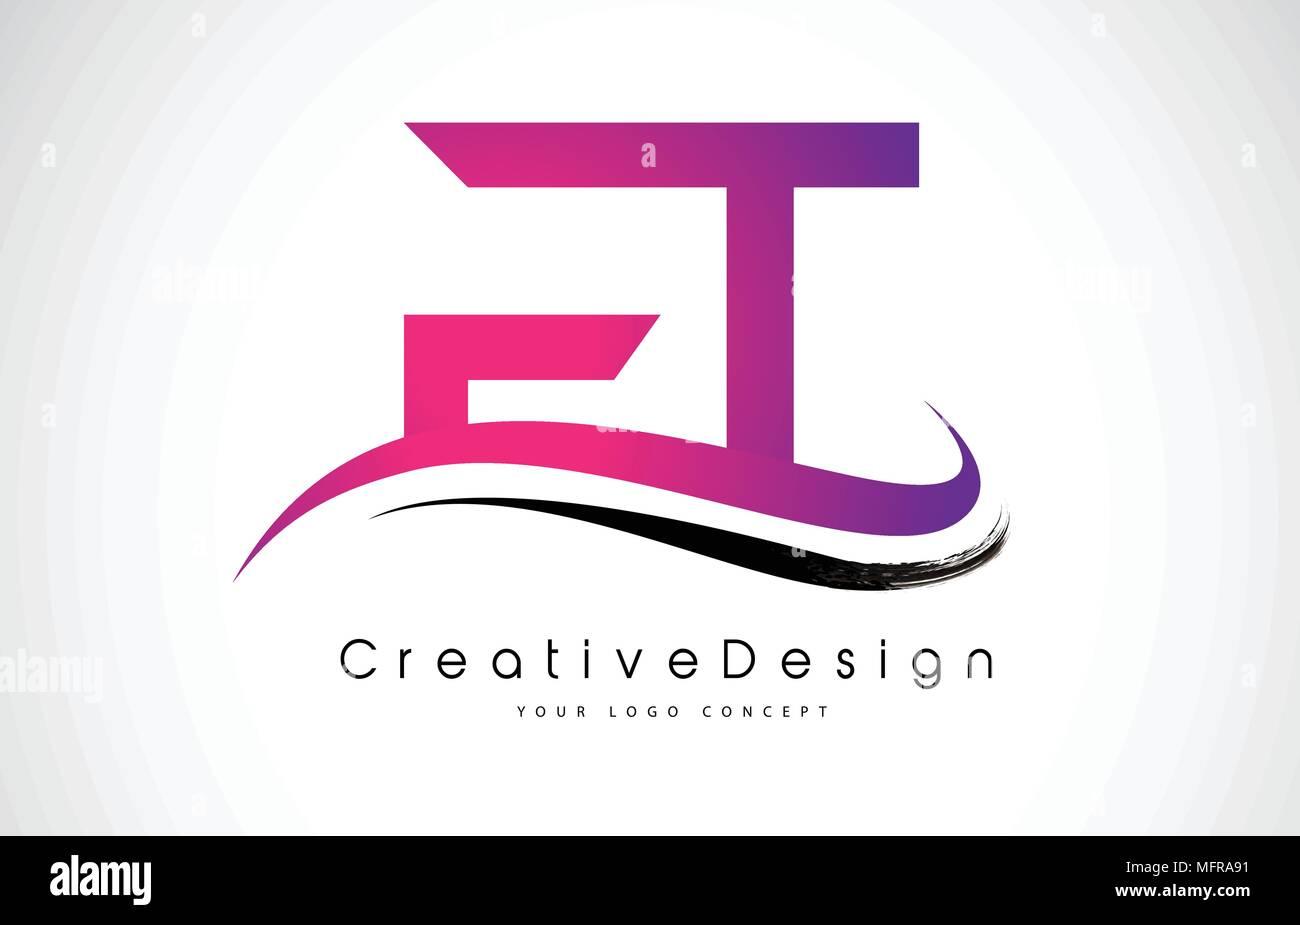 FT F T Letter Logo Design in Black Colors. Creative Modern Letters ...